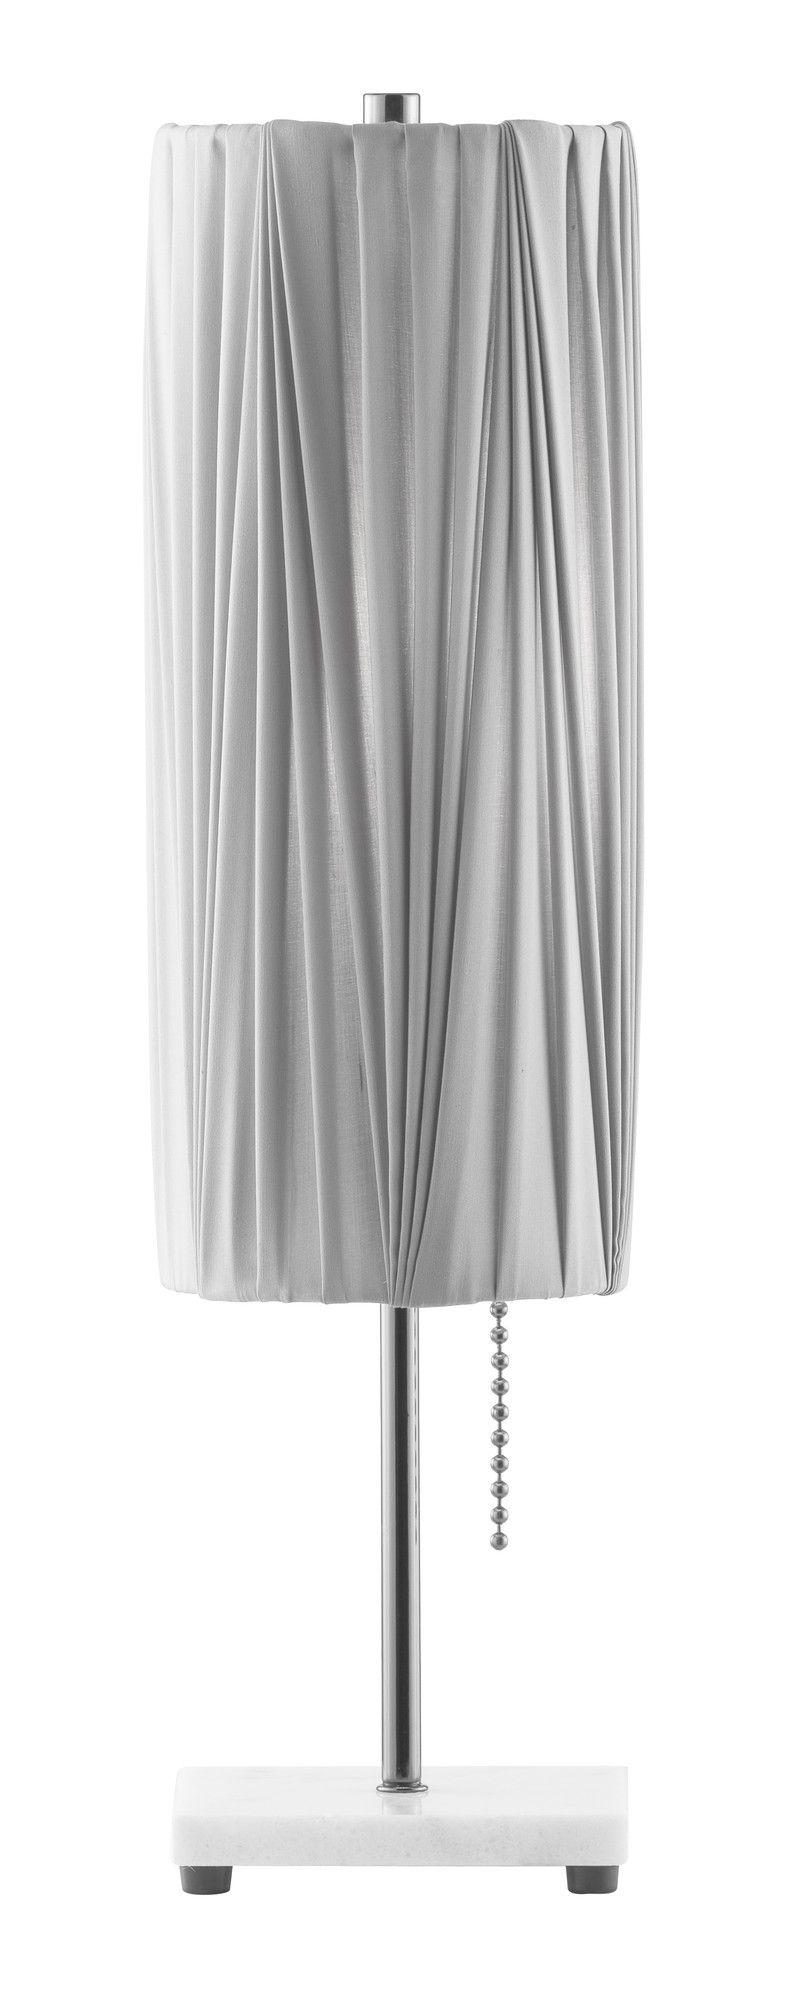 "Lollipop 22.5"" Table Lamp"